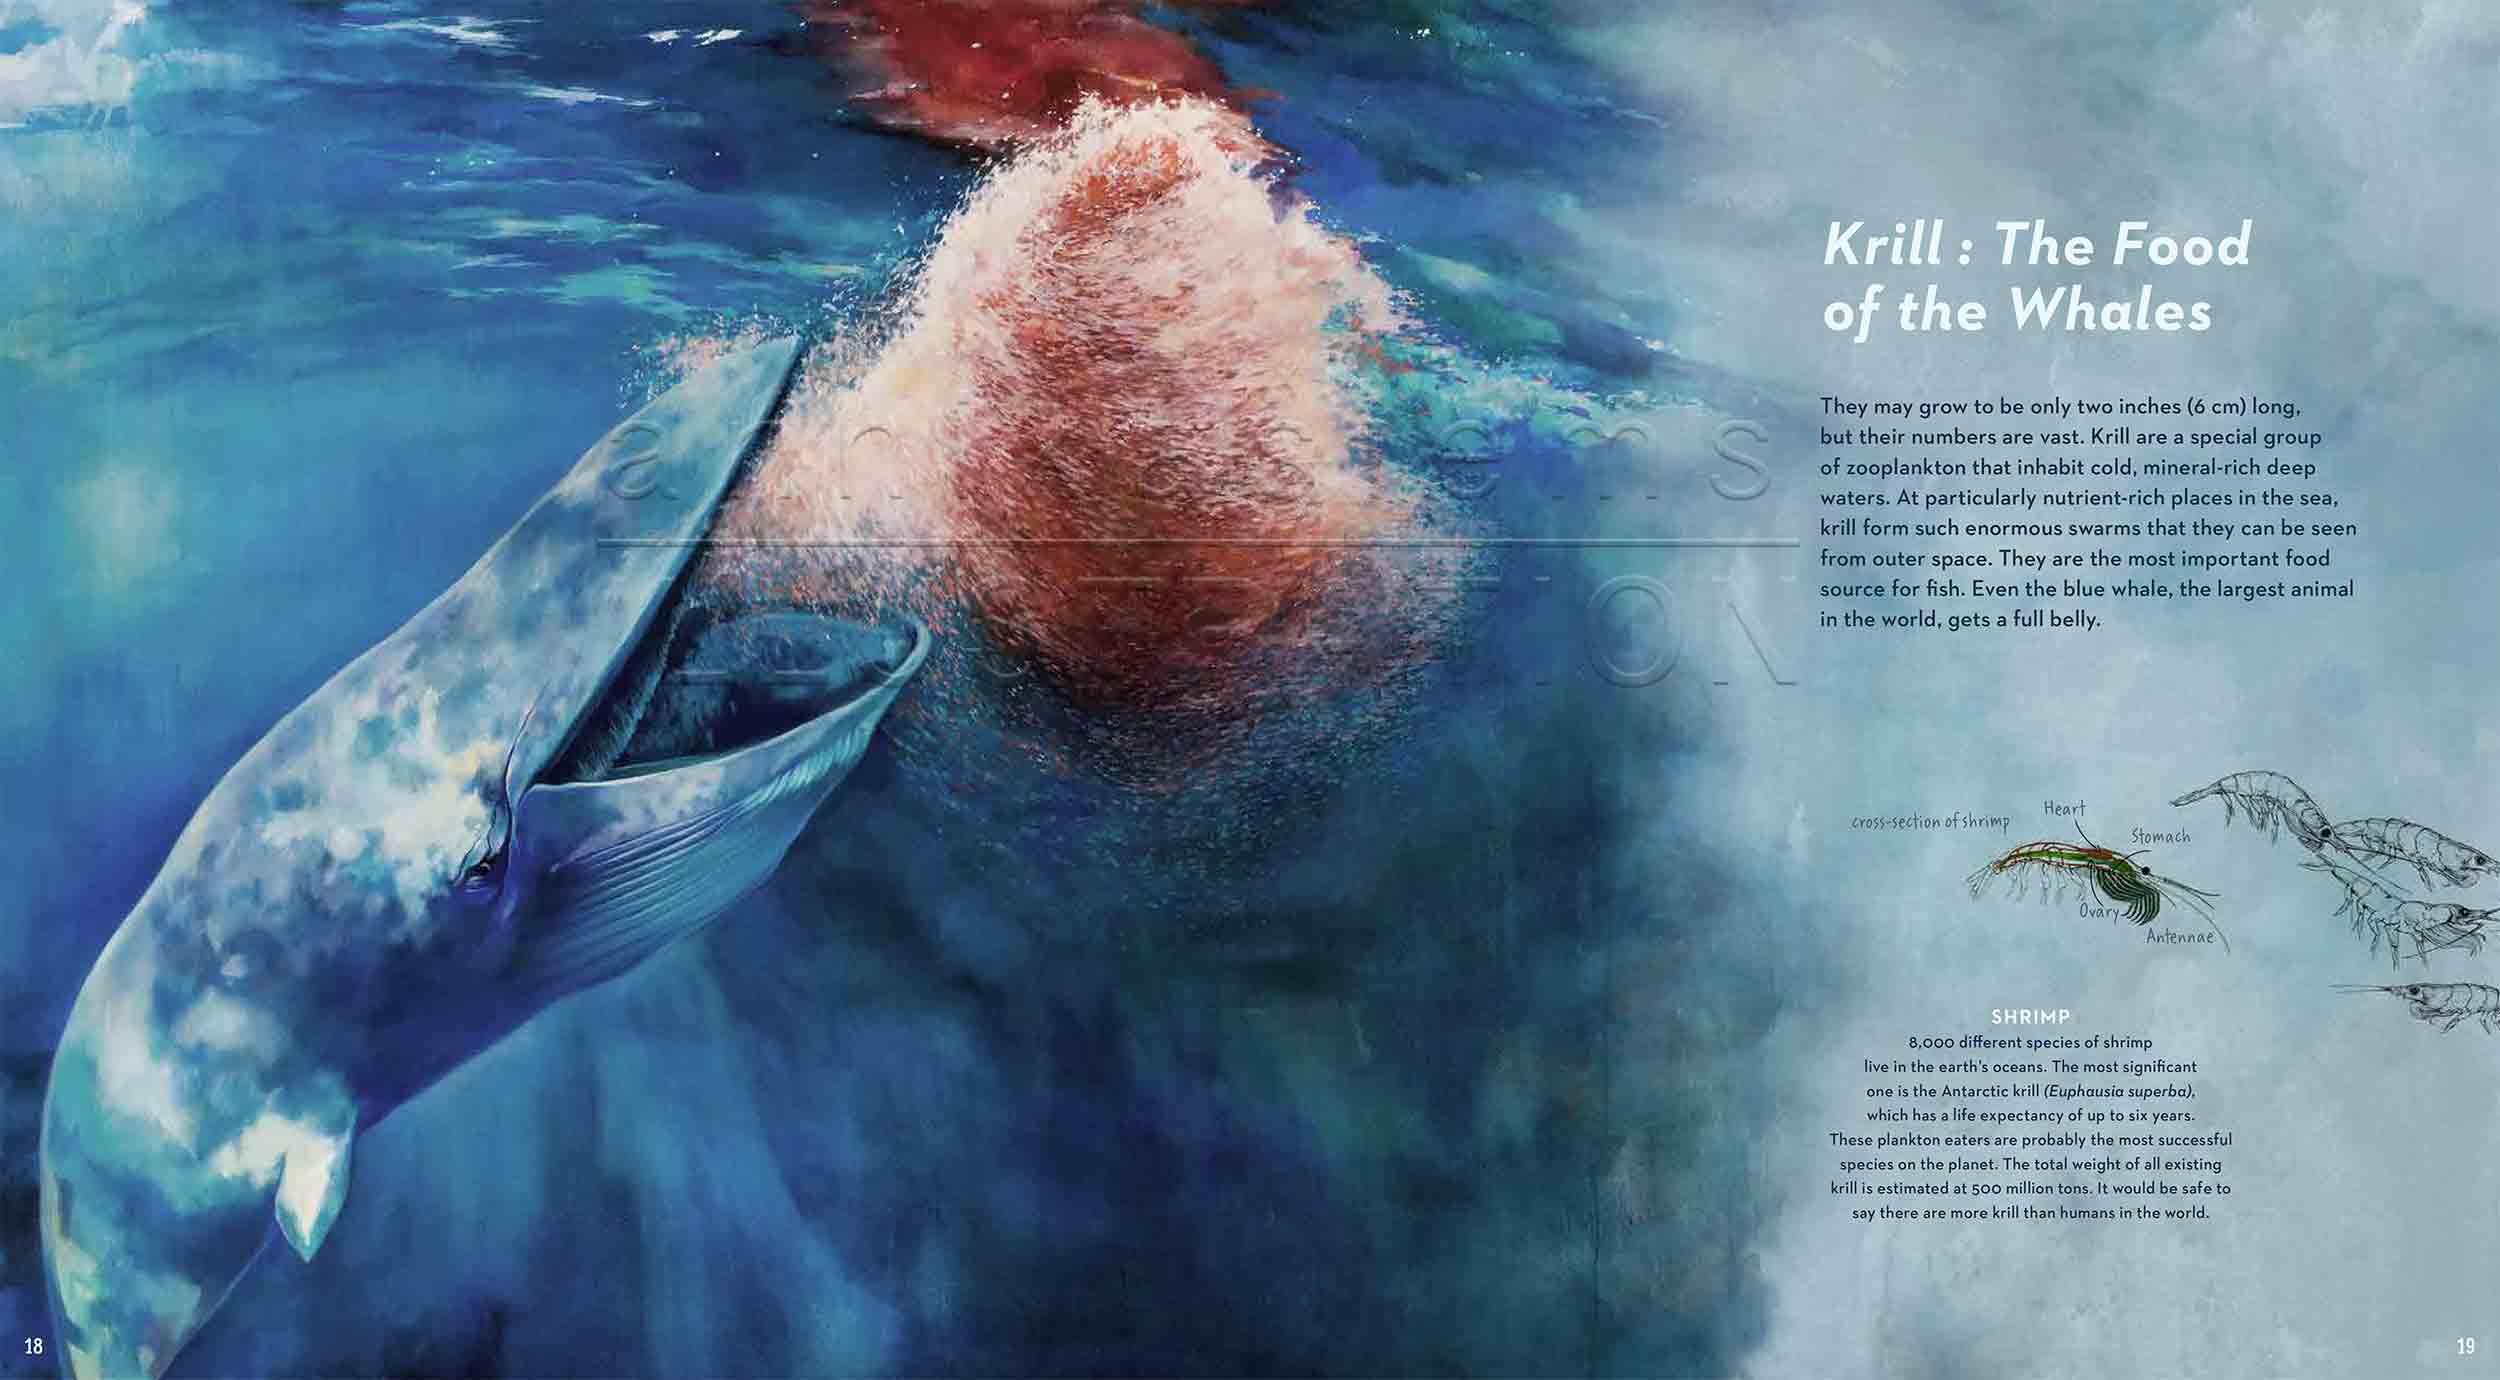 18-19deep-sea-Englisch-bluewhale-krill-©annikasiems-plankton_deepsea-zooplankton.jpg